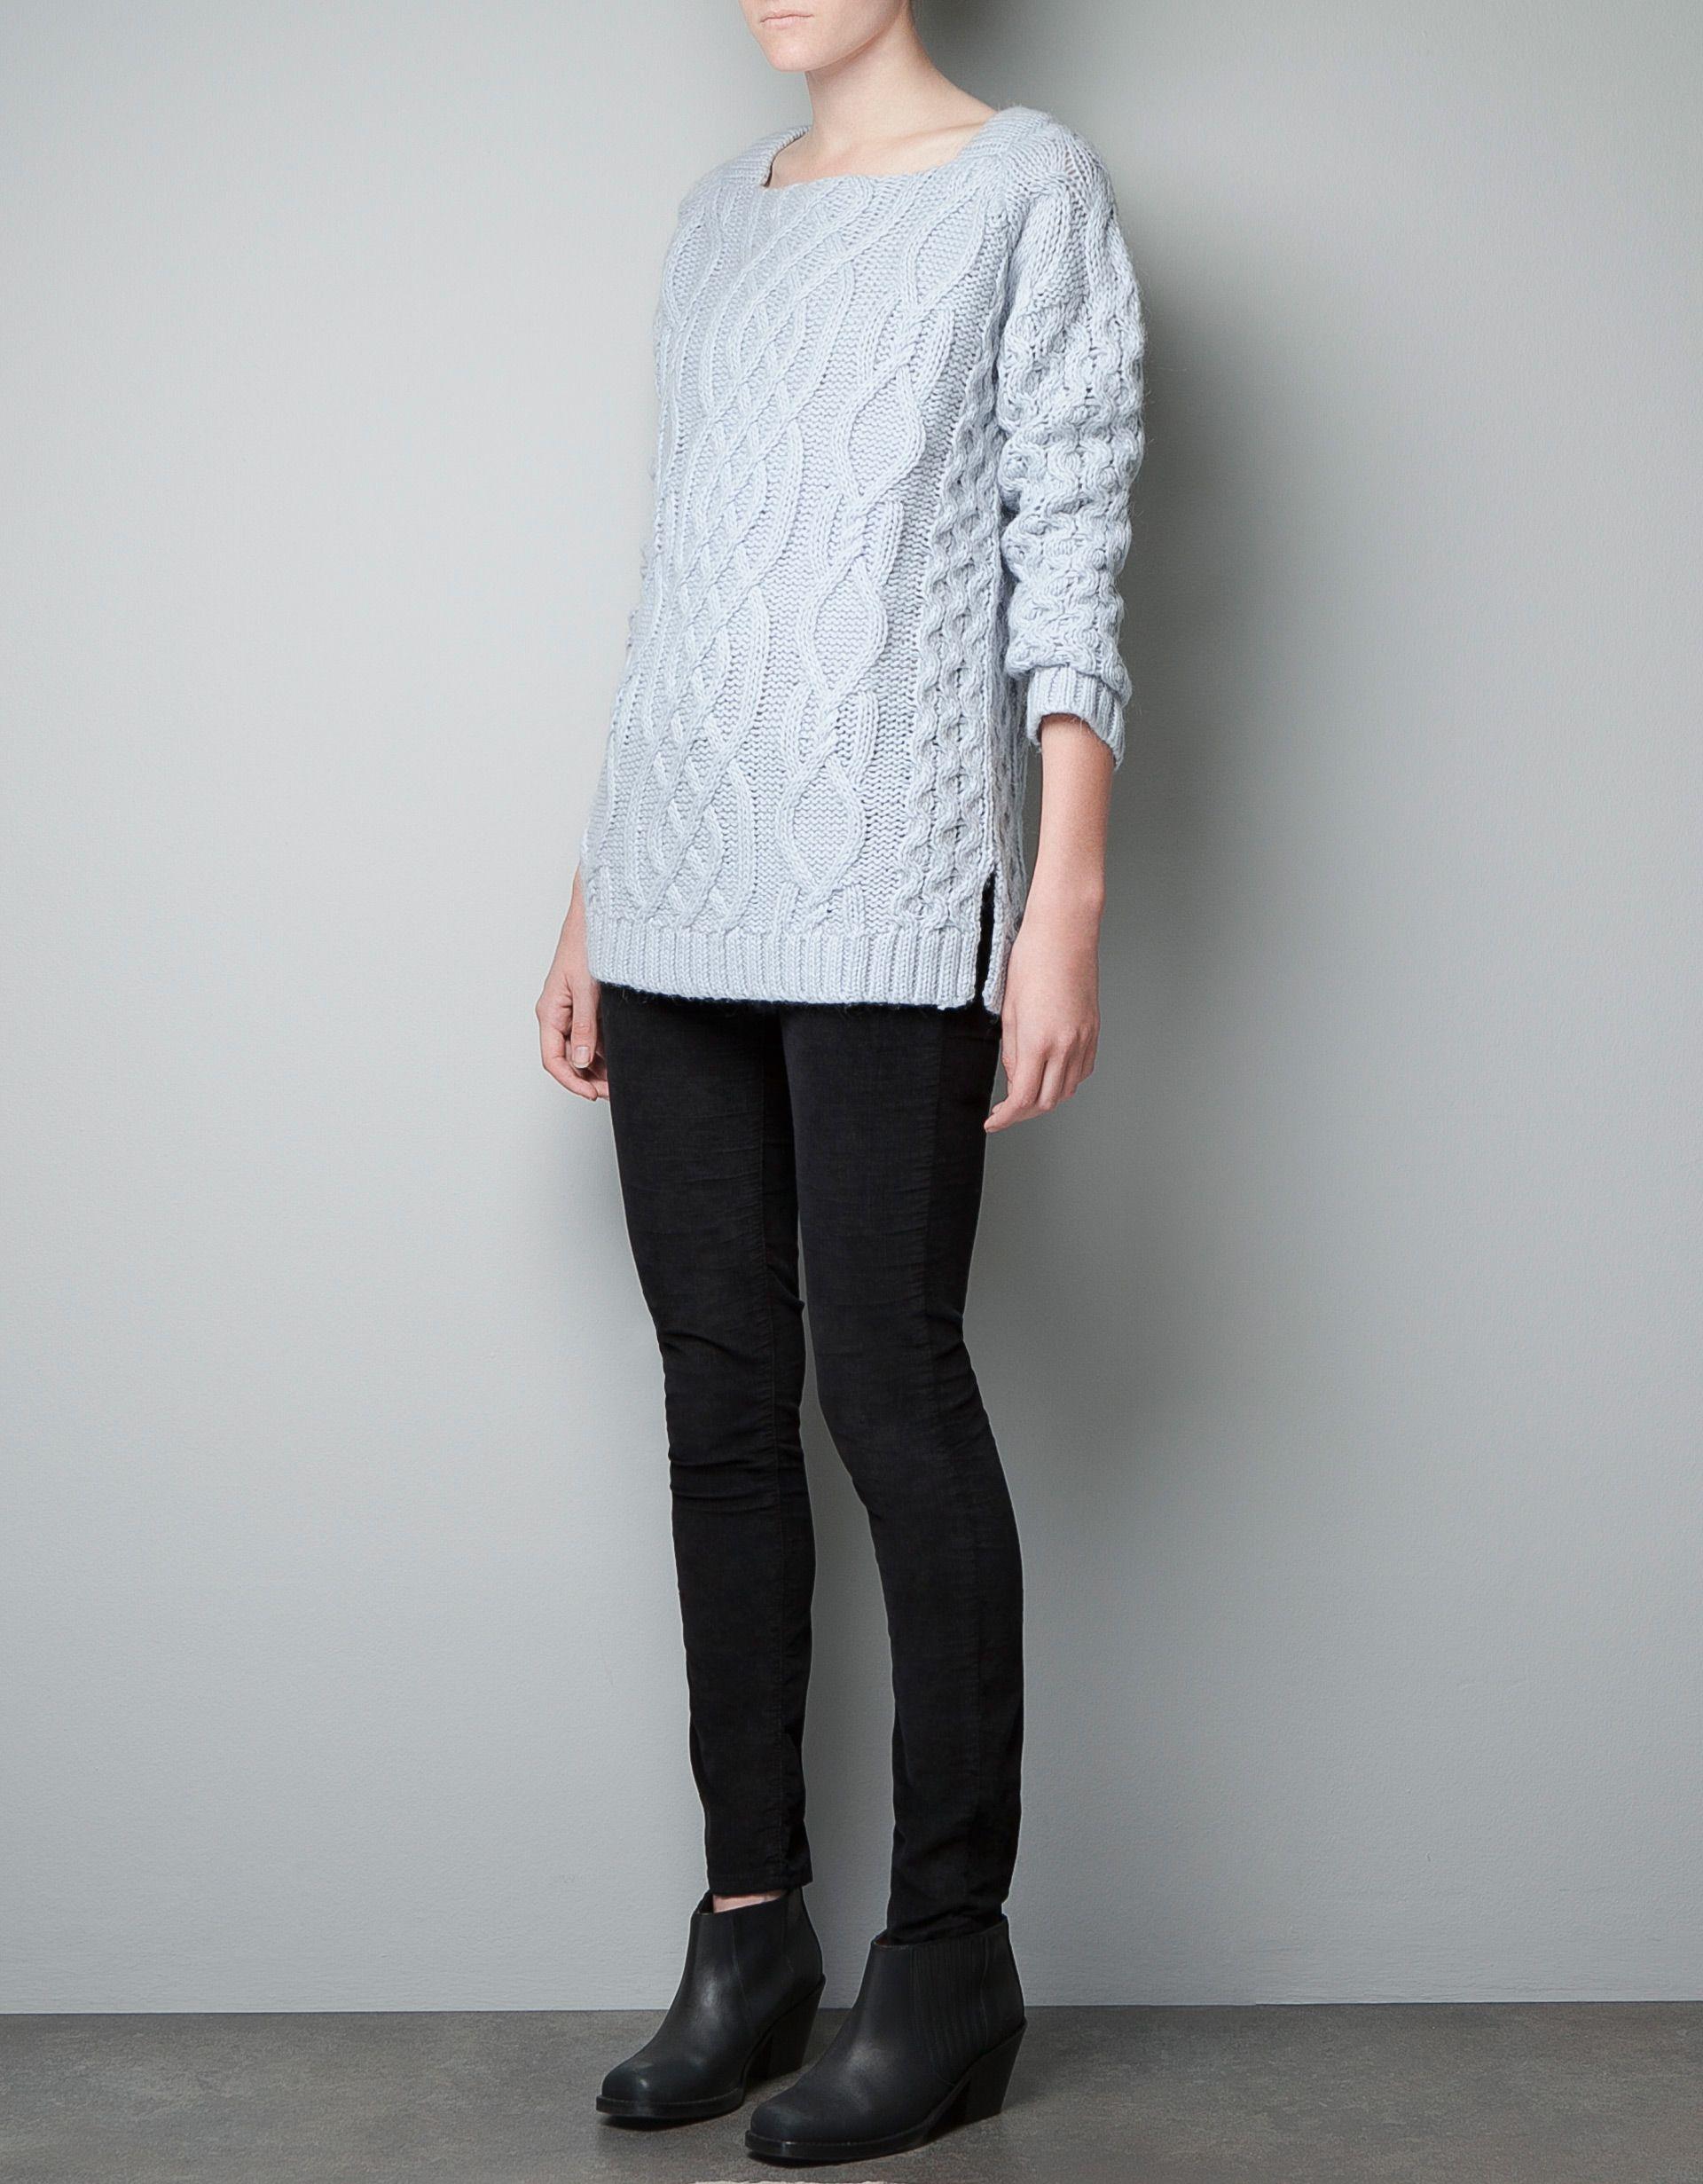 ba00cbde CABLE KNIT SWEATER WITH SIDE SLITS - Knitwear - Woman - ZARA Norway ...